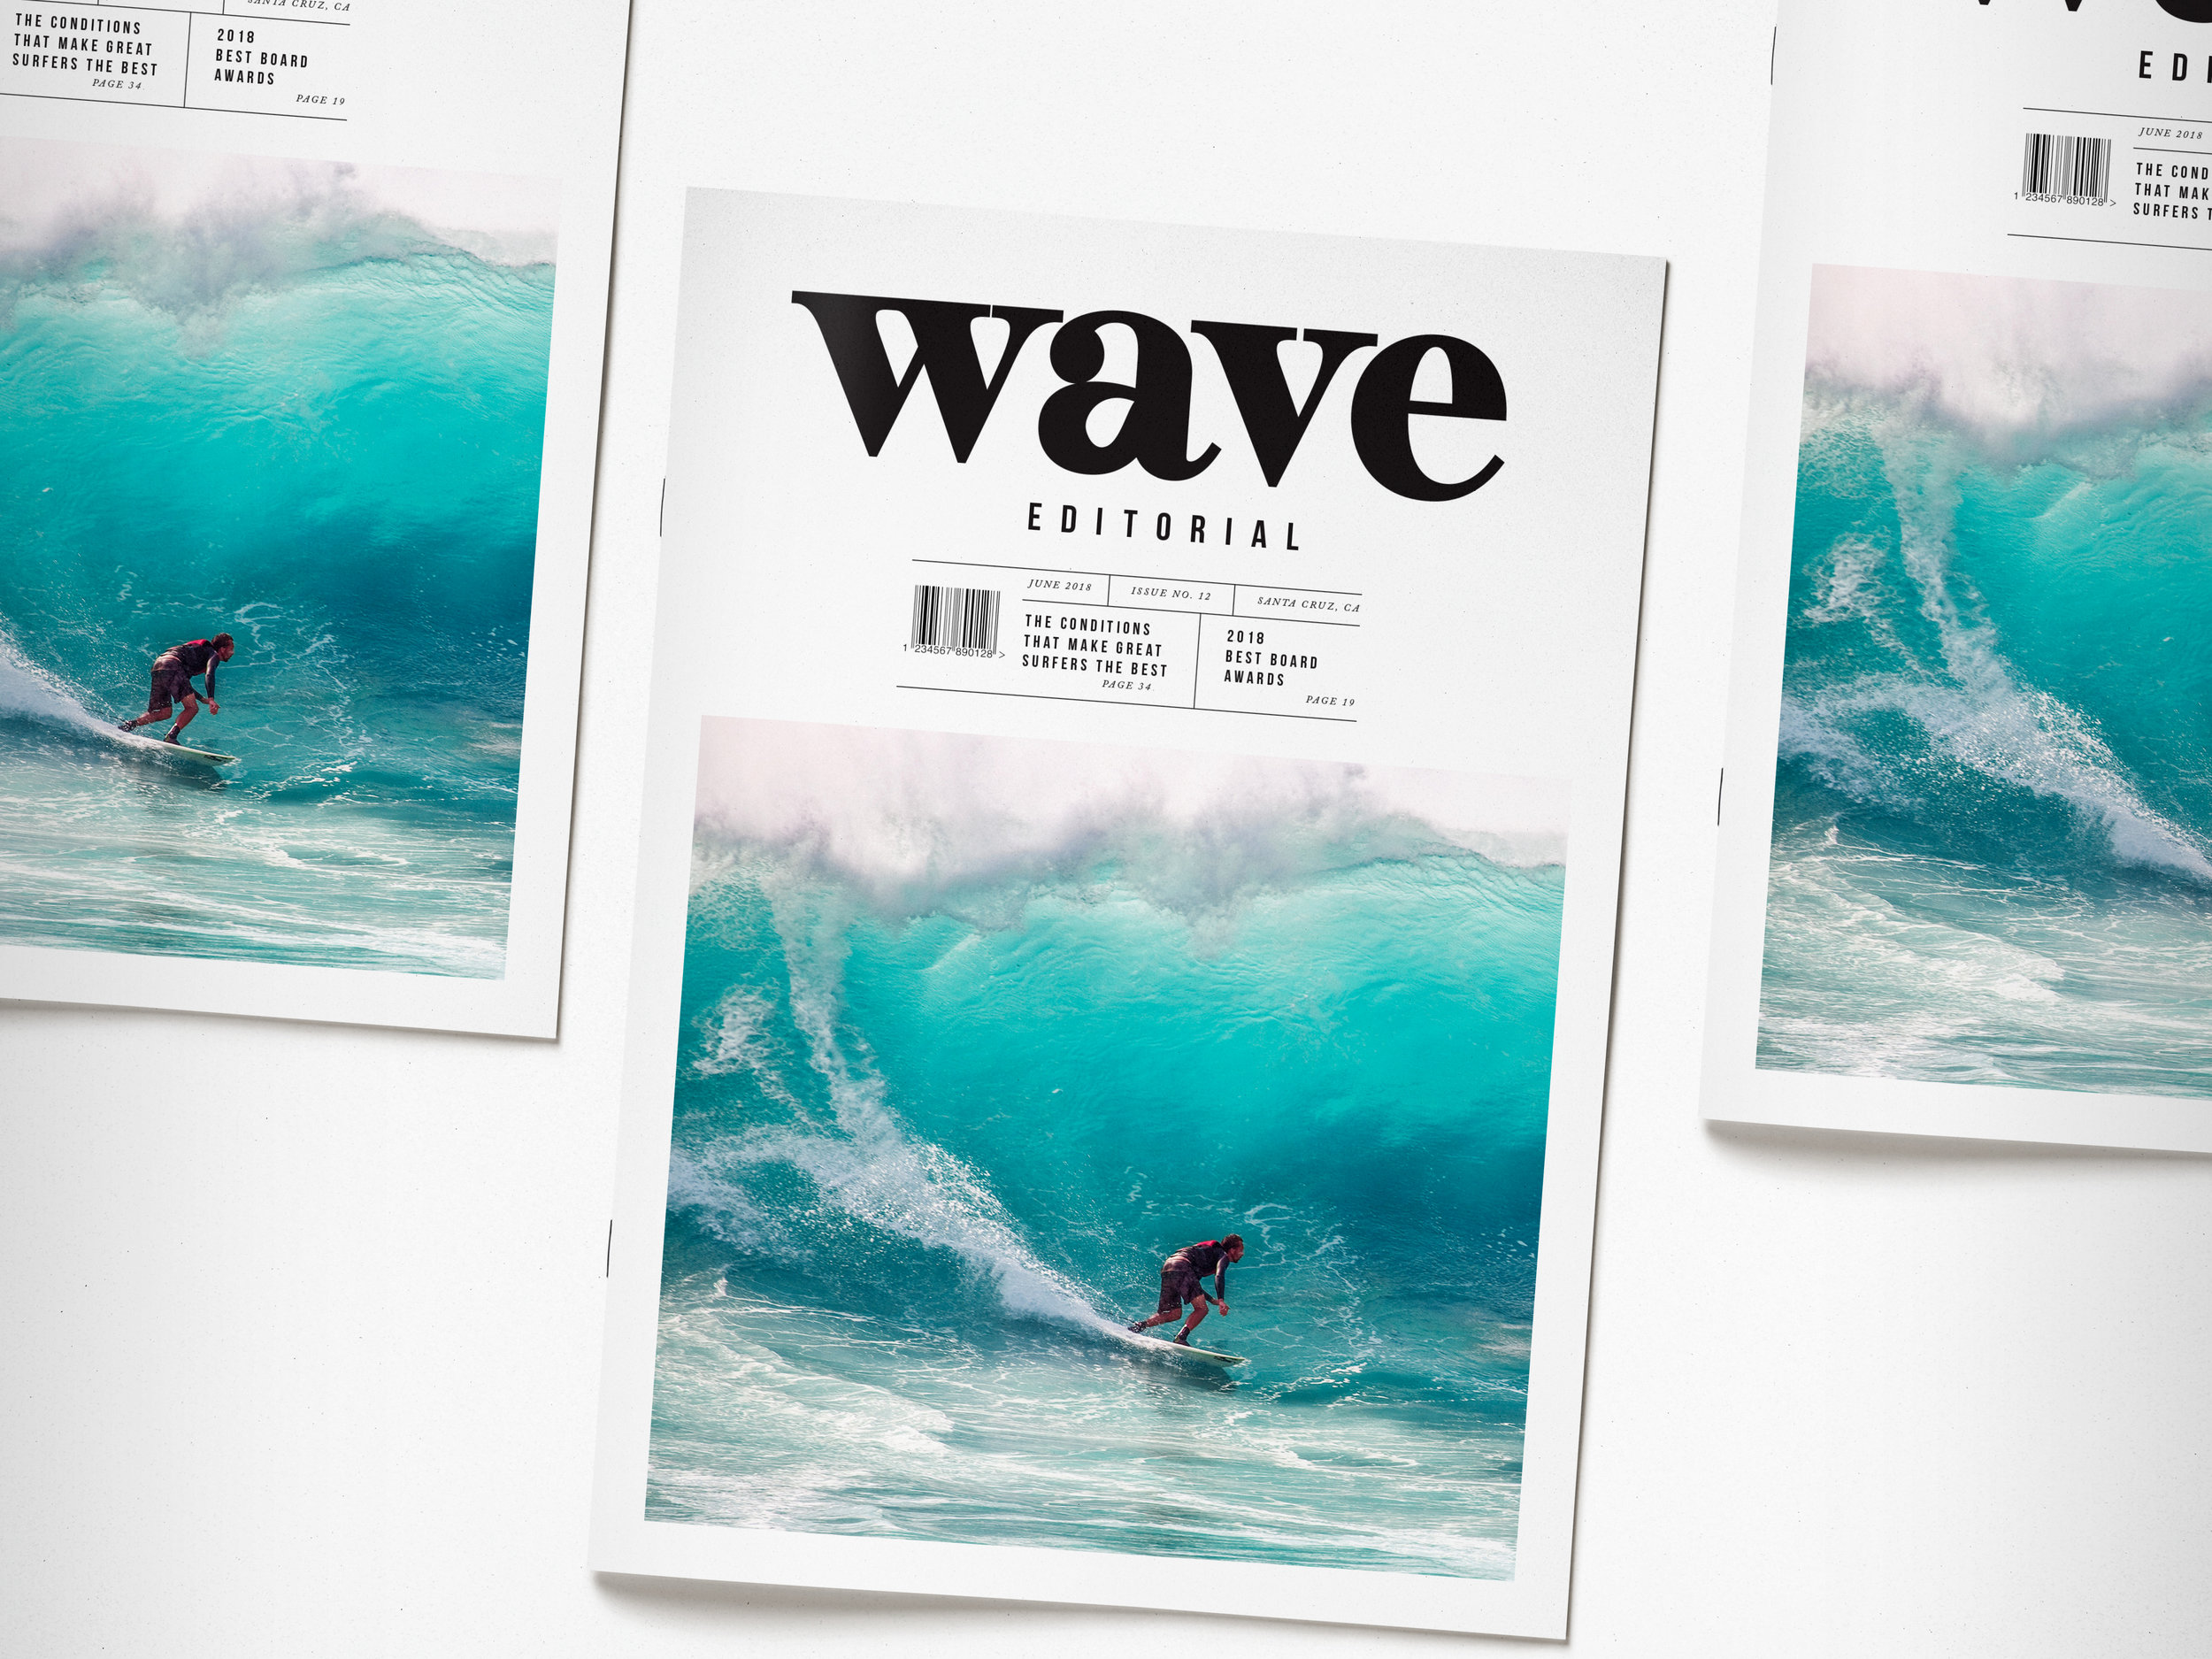 wavecover.jpg